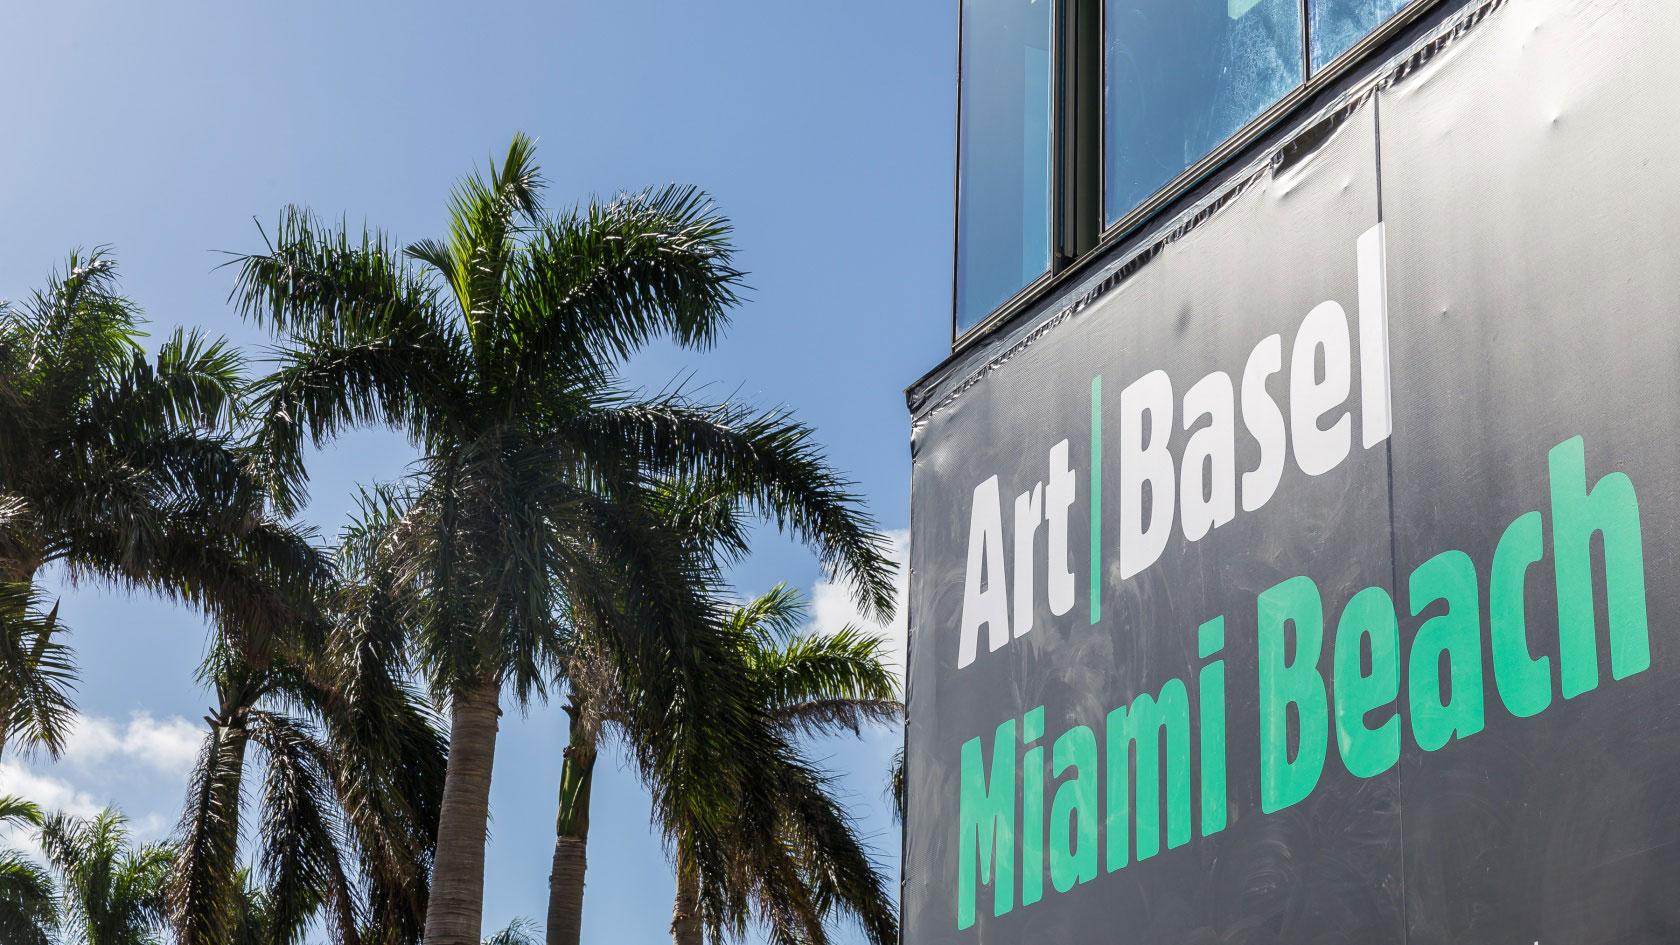 art-basel-miami-beach-article-image-01.jpg_asset_1554799909138.jpg